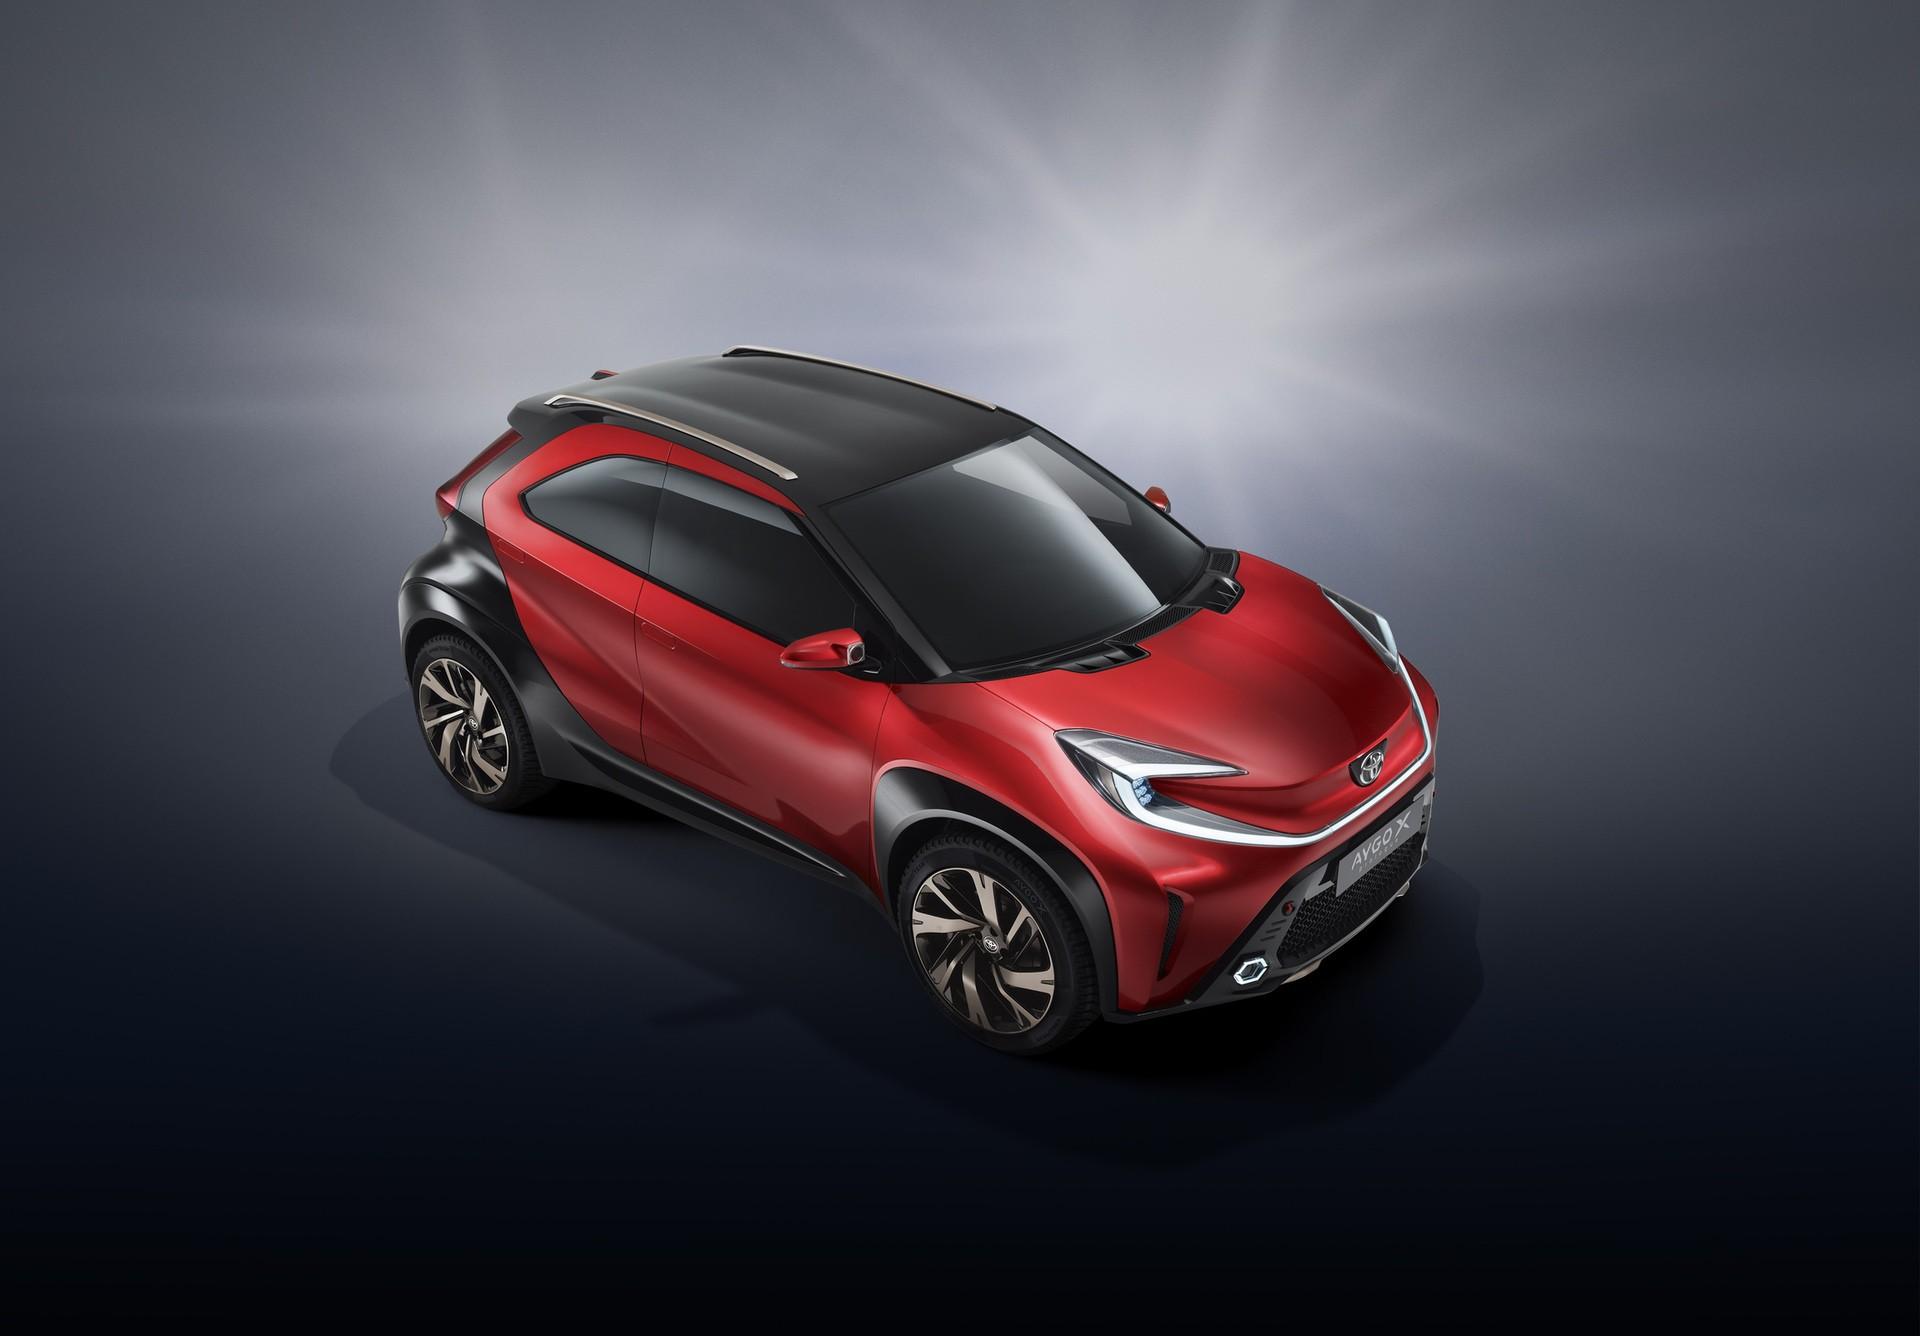 Toyota_Aygo_X_prologue-0028